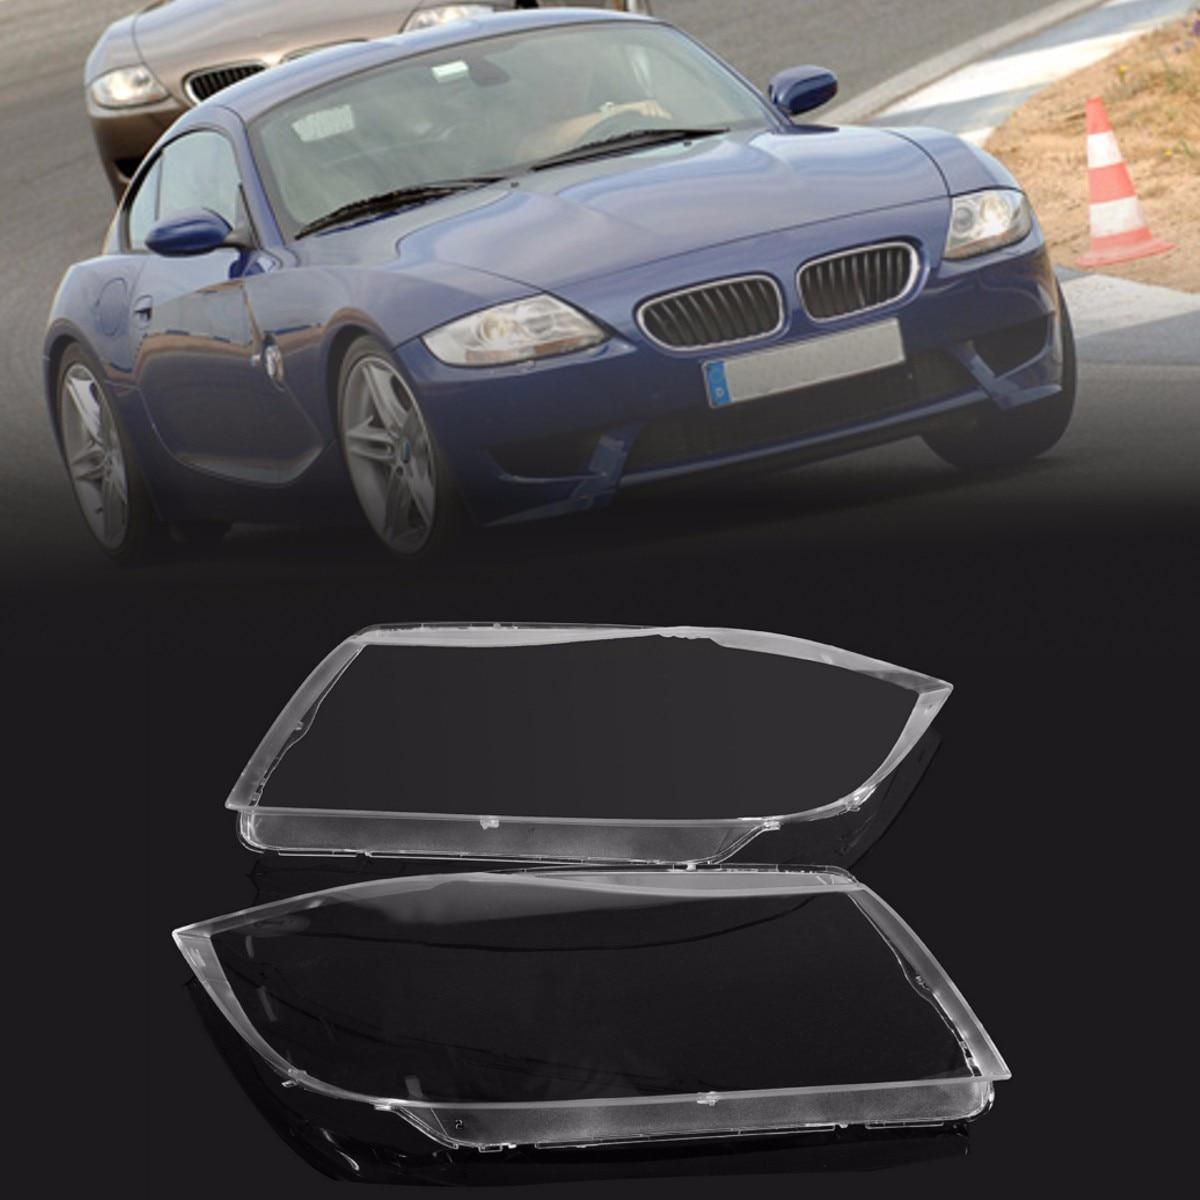 For BMW E90/E91 04-07 Pair Front Headlamp Clear Lens Headlight Plastic Shell Clear Cover велоочки 100% accuri pollok clear lens 50200 199 02